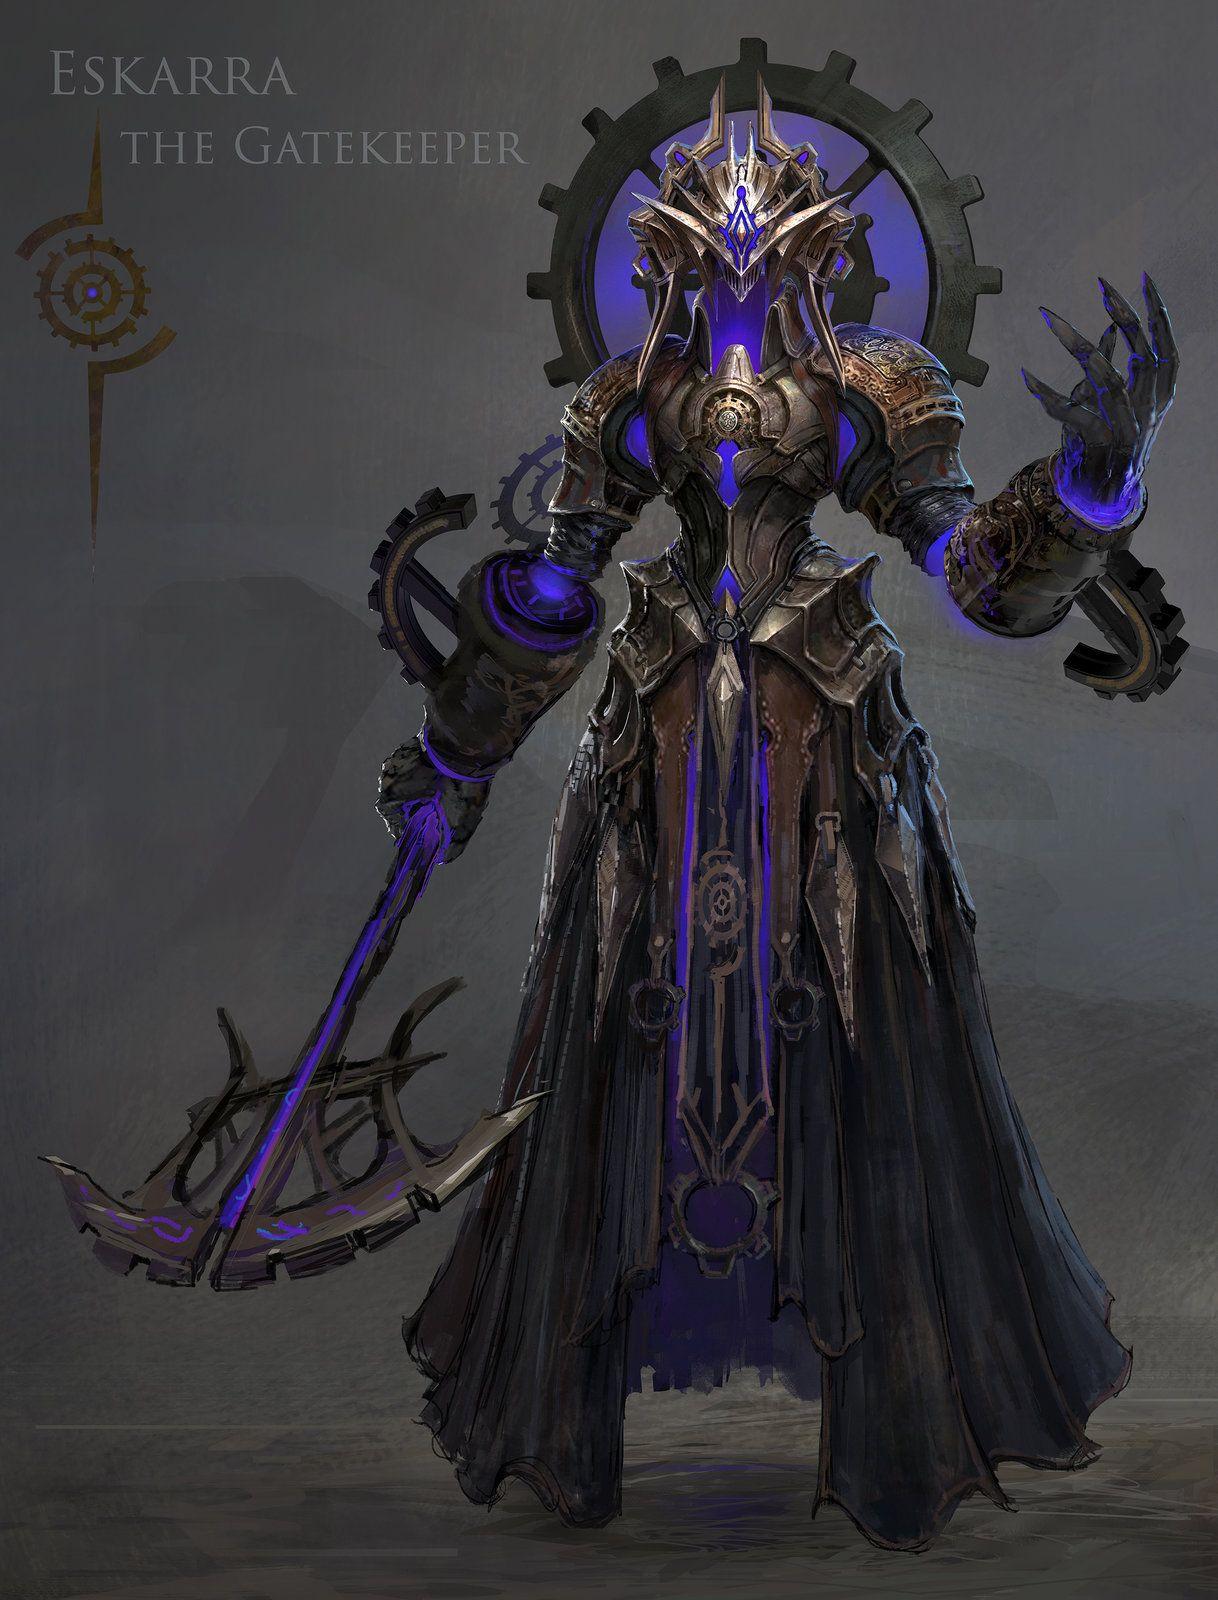 Eskarra the Gatekeeper, MuYoung Kim Fantasy armor